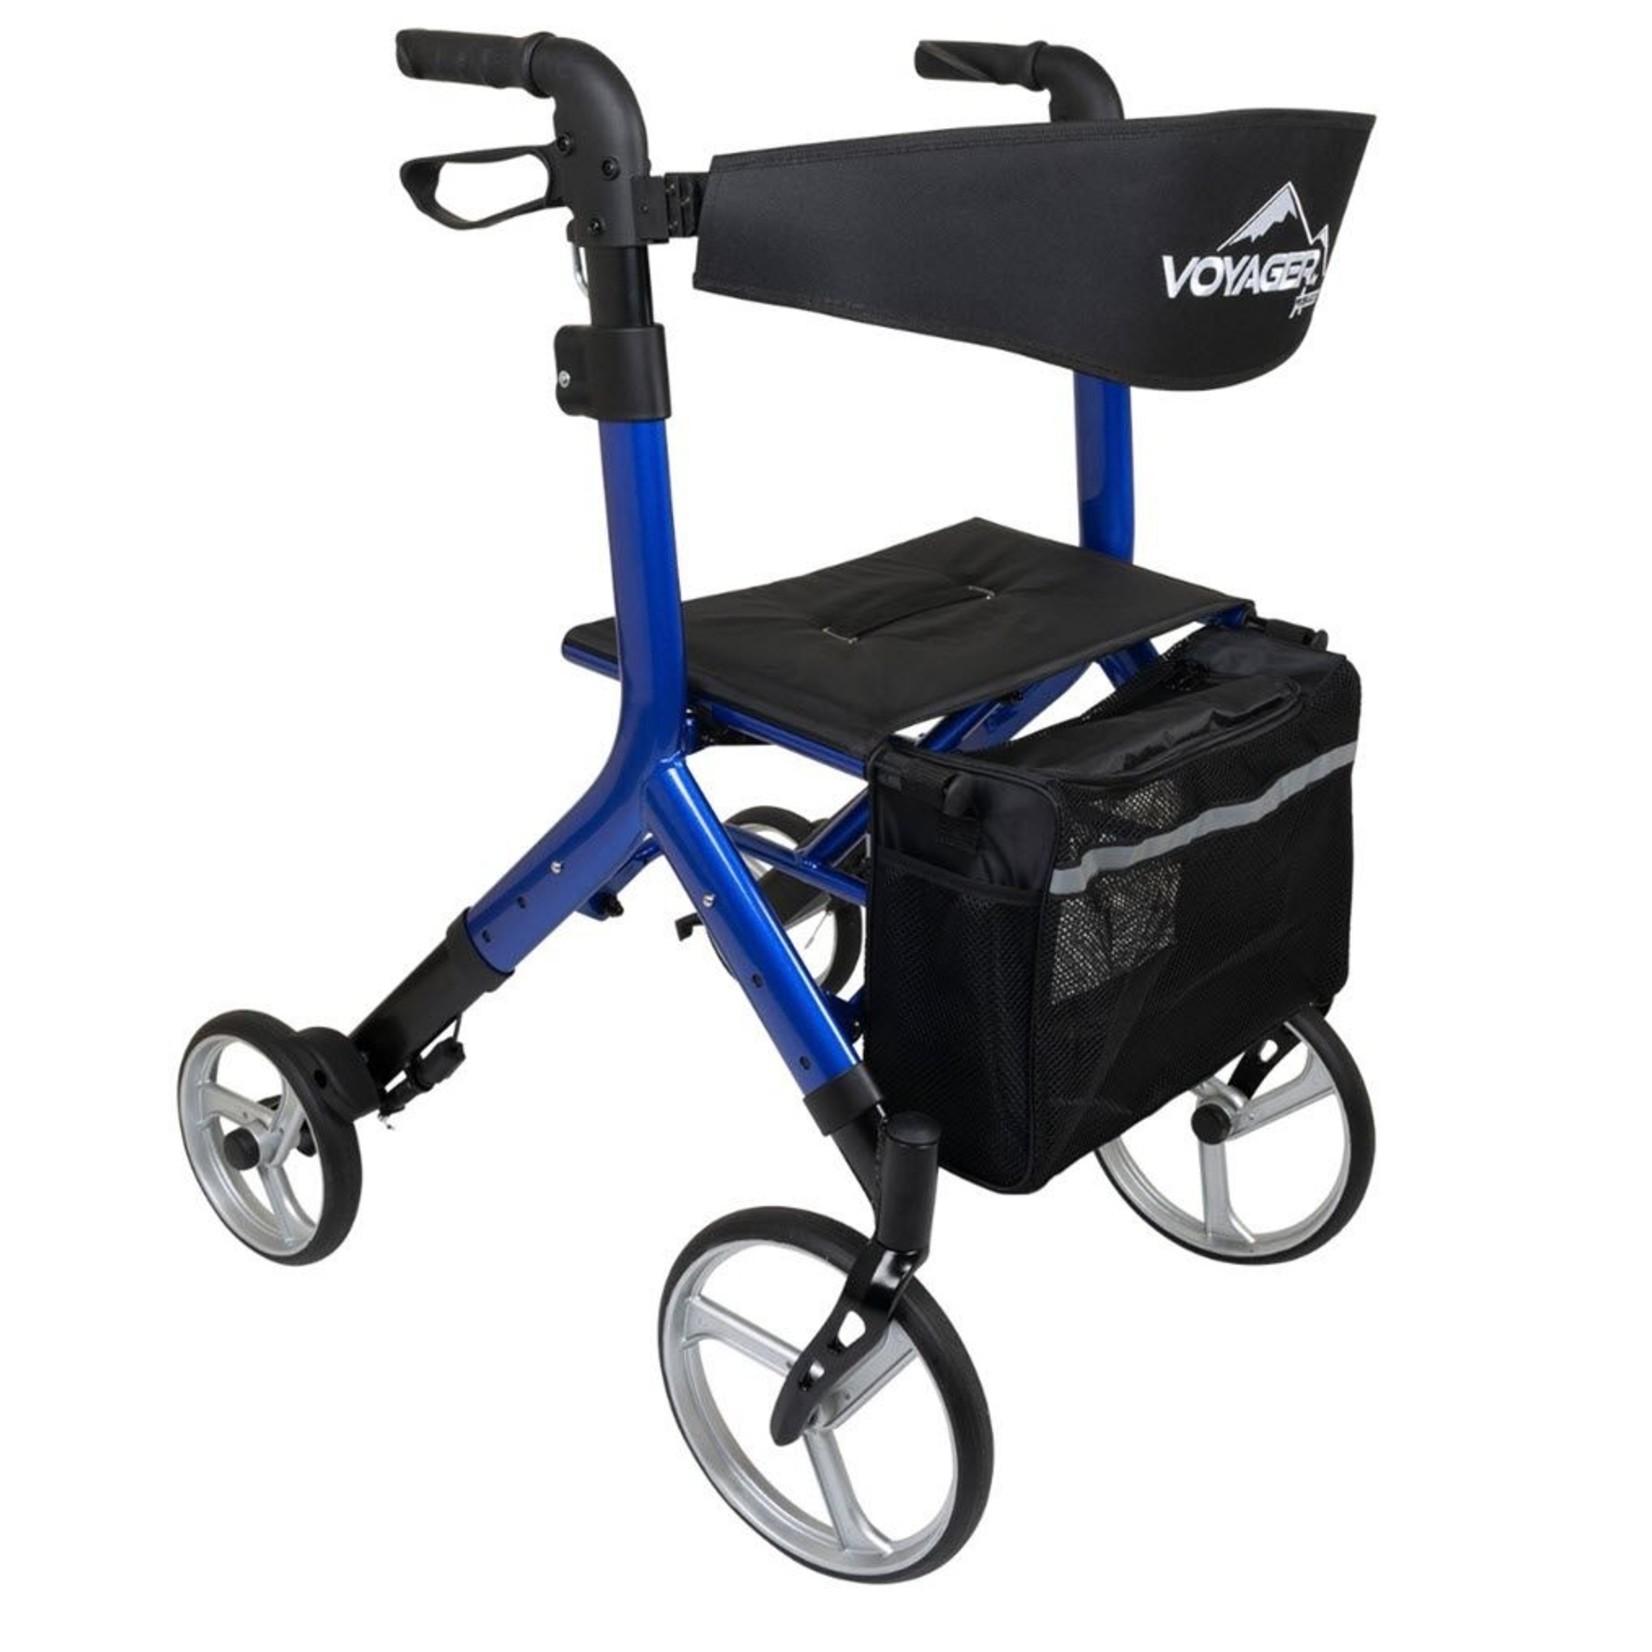 Voyager Euro Style Rollator Cobalt Blue